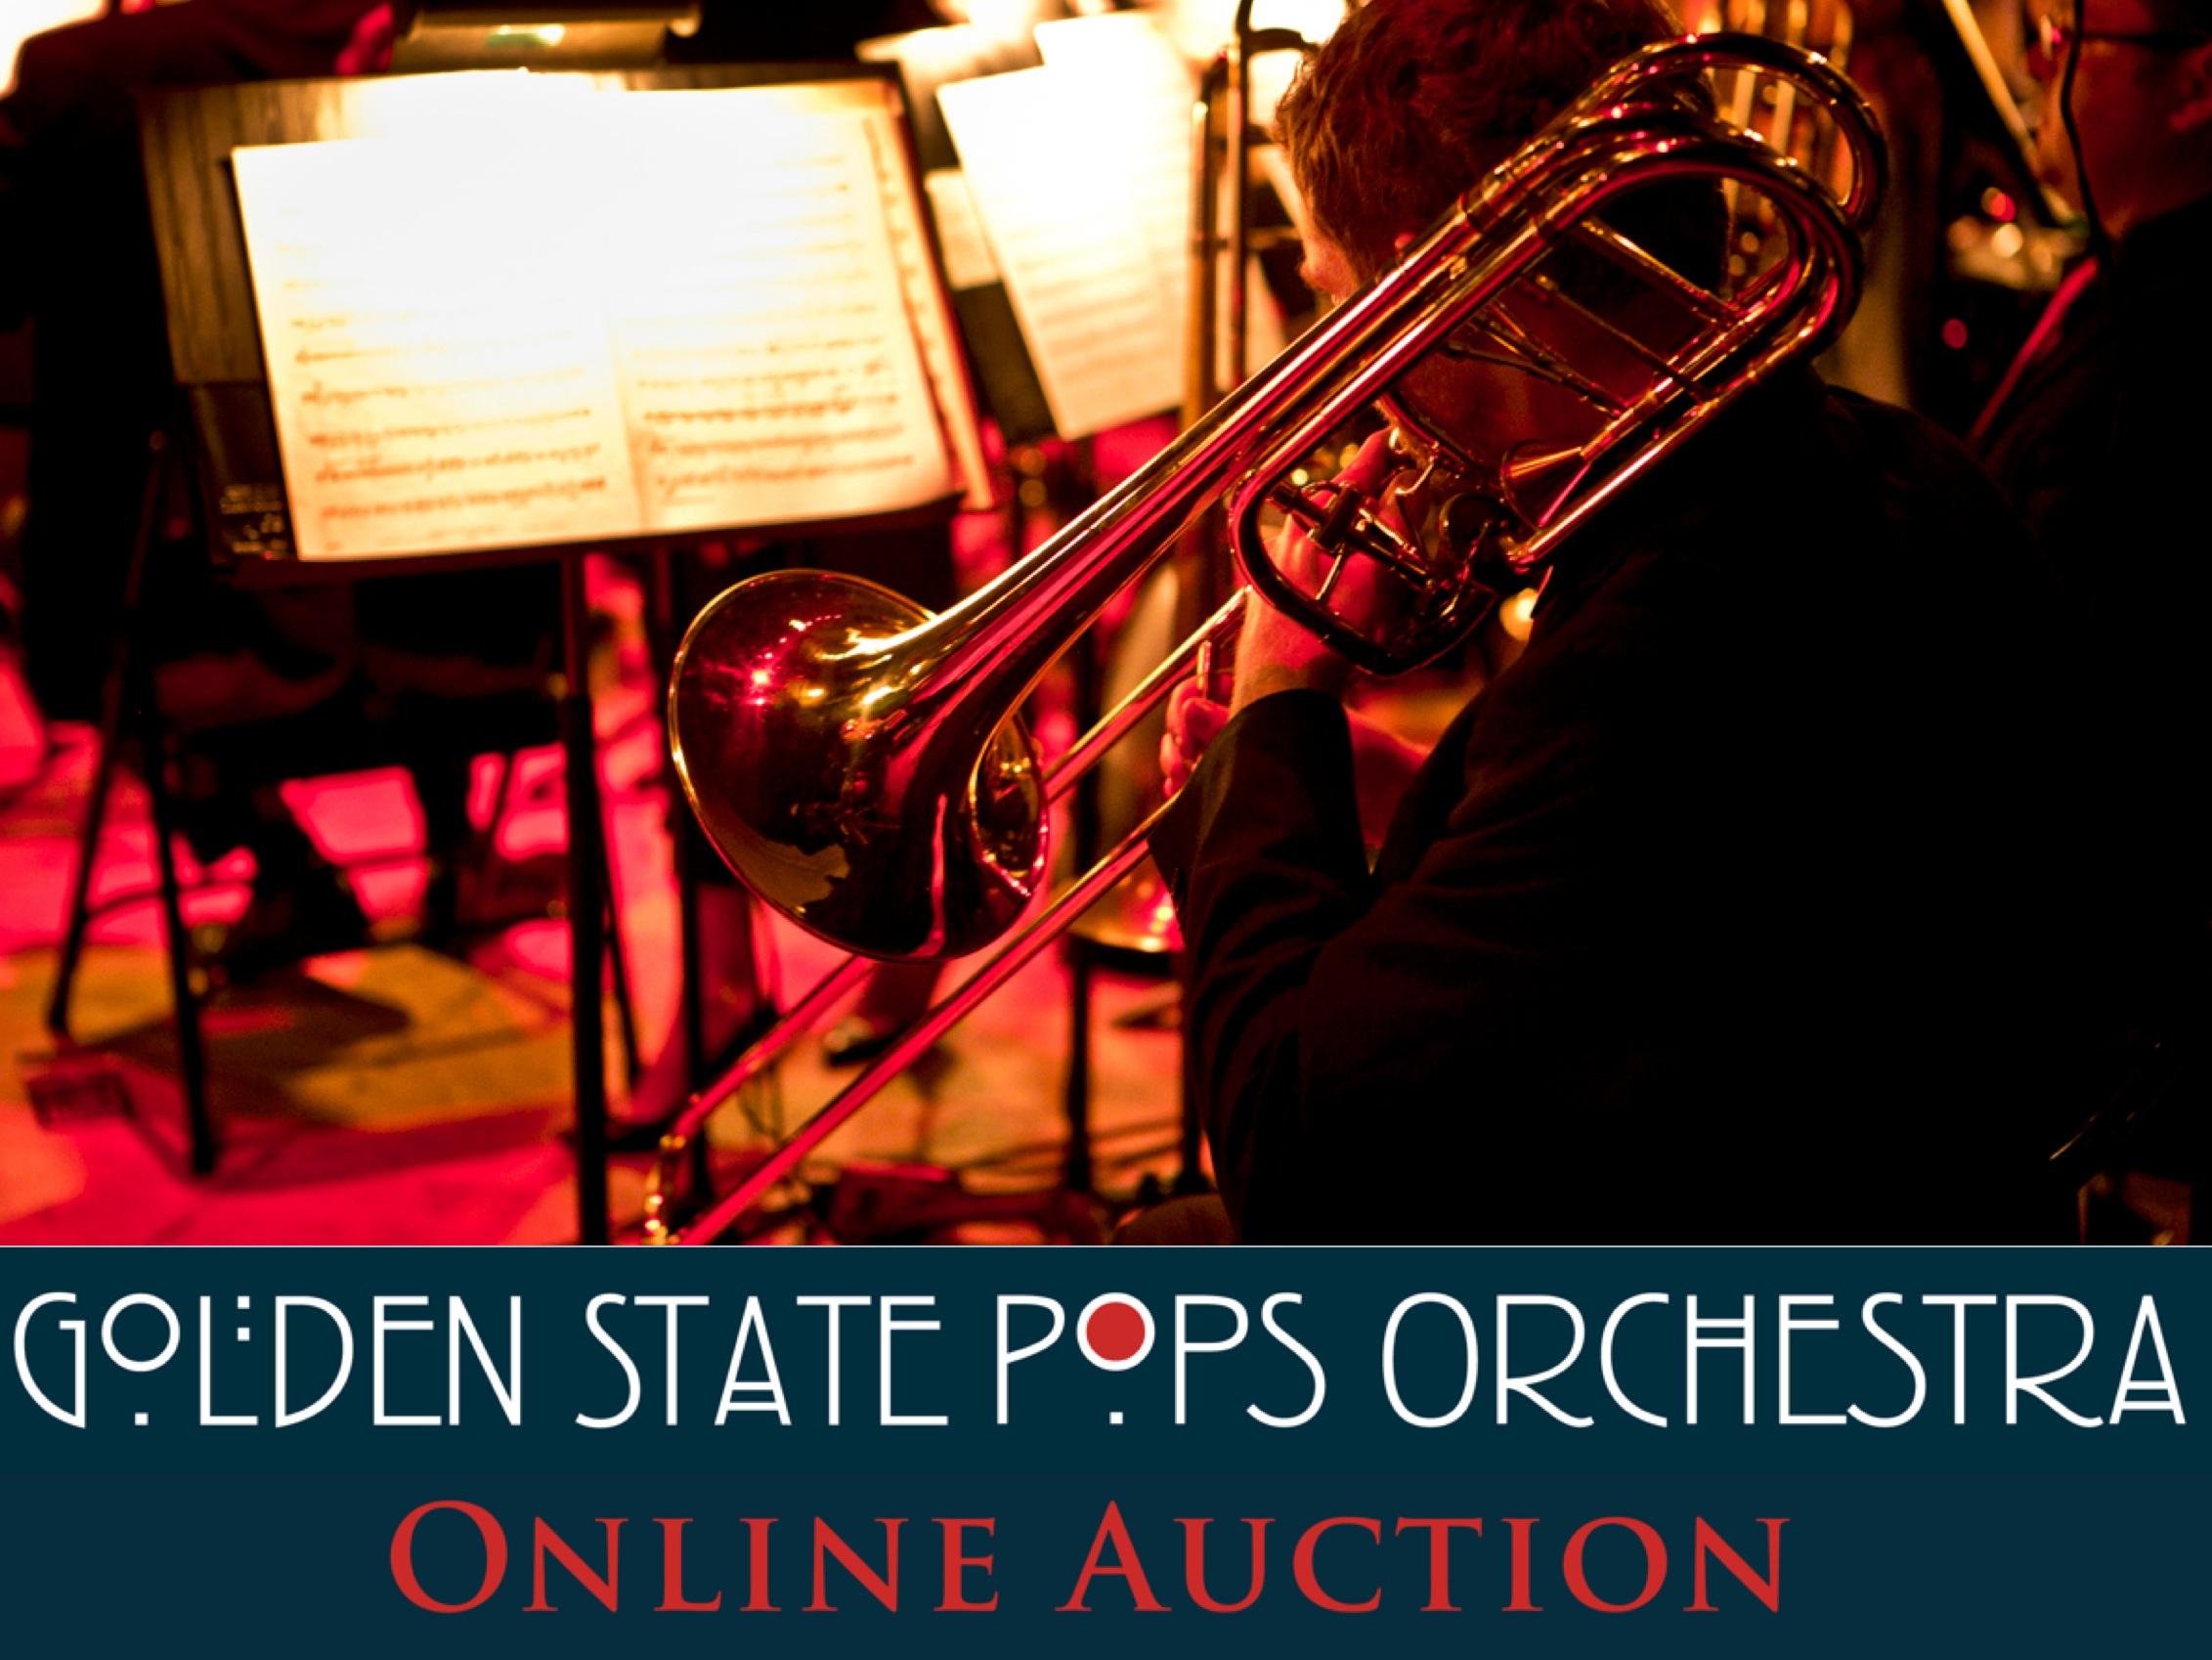 GSPO+Auction+logo+image.jpg